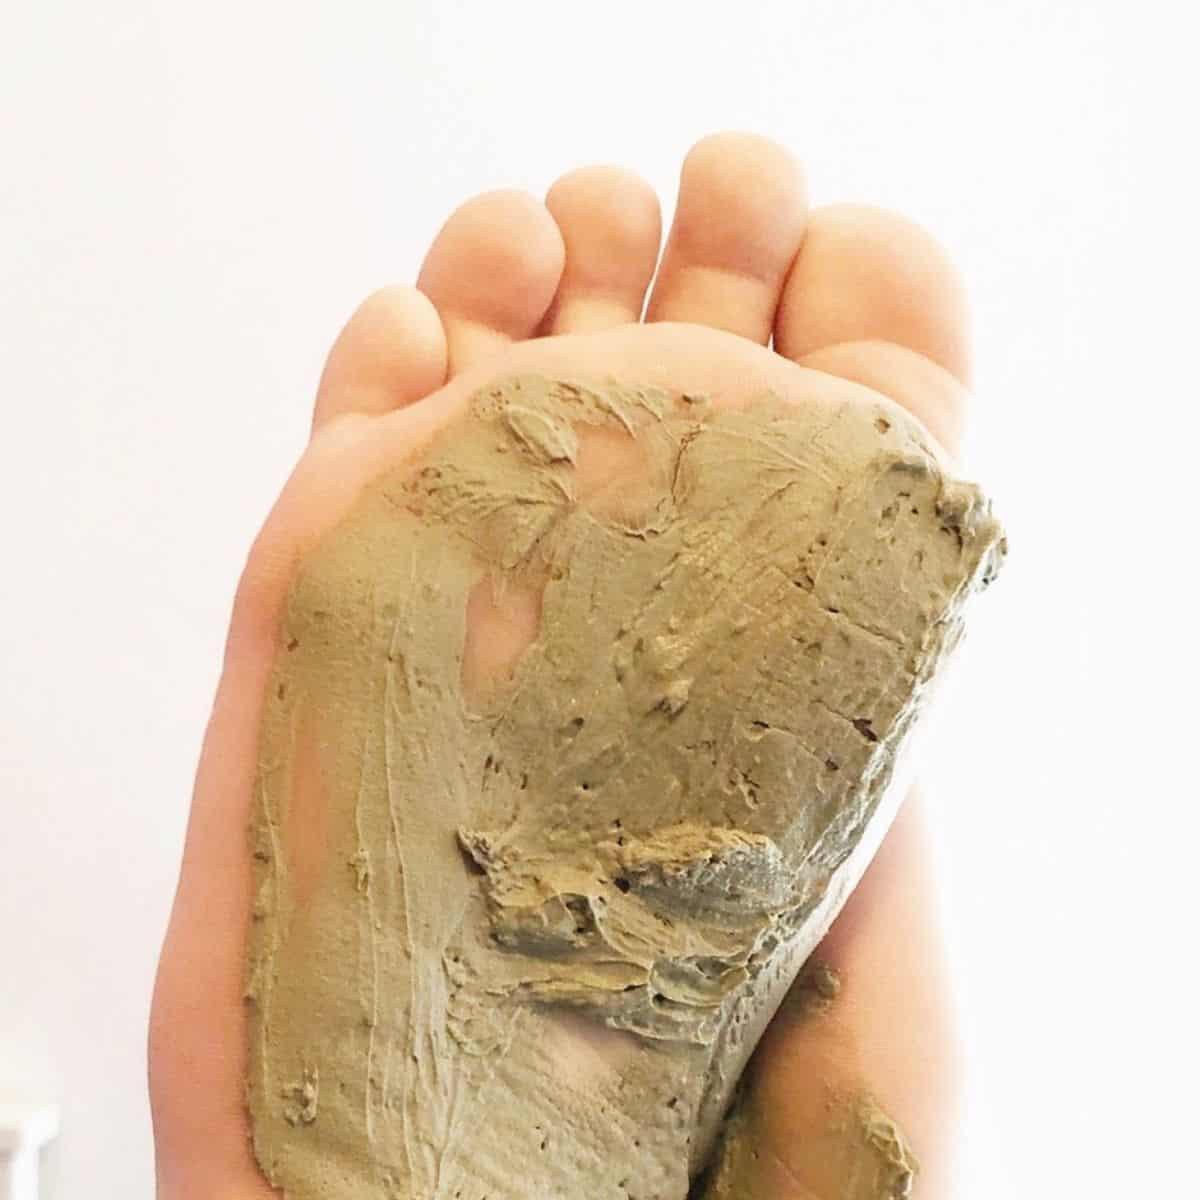 DIY Detox Clay Foot Mask & Soak Recipe